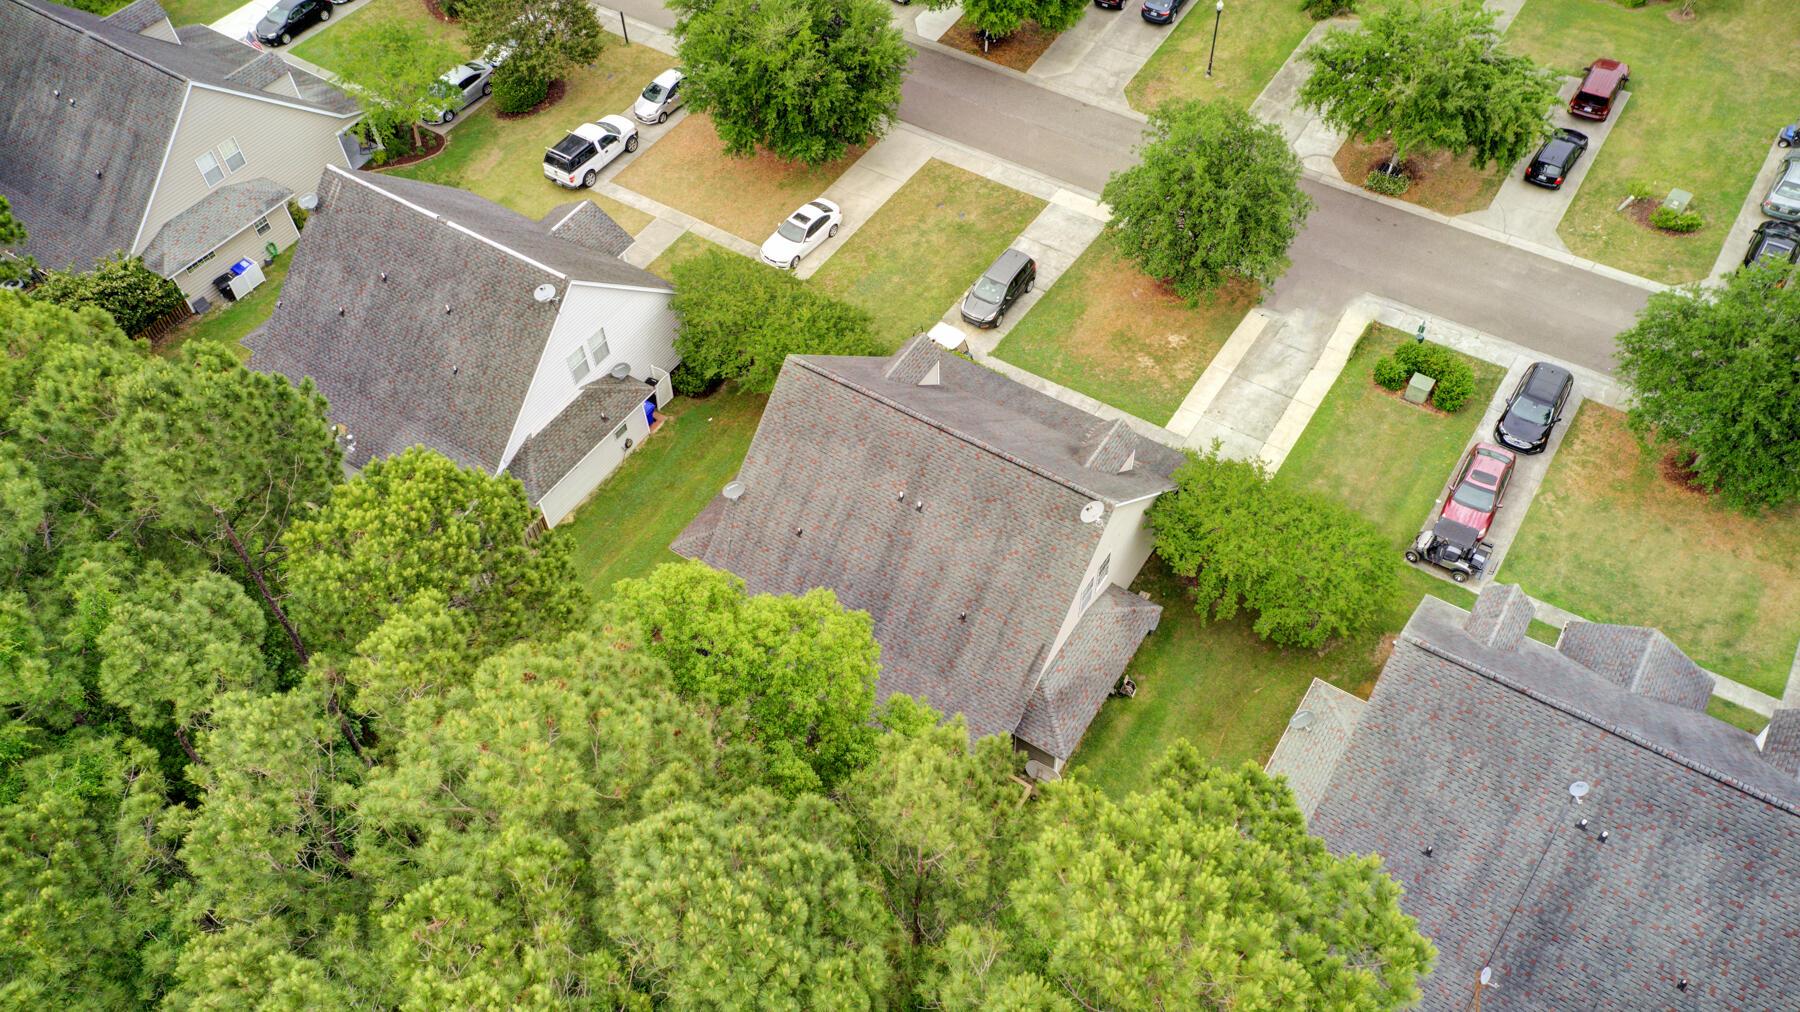 Dunes West Homes For Sale - 2232 Kings Gate, Mount Pleasant, SC - 4